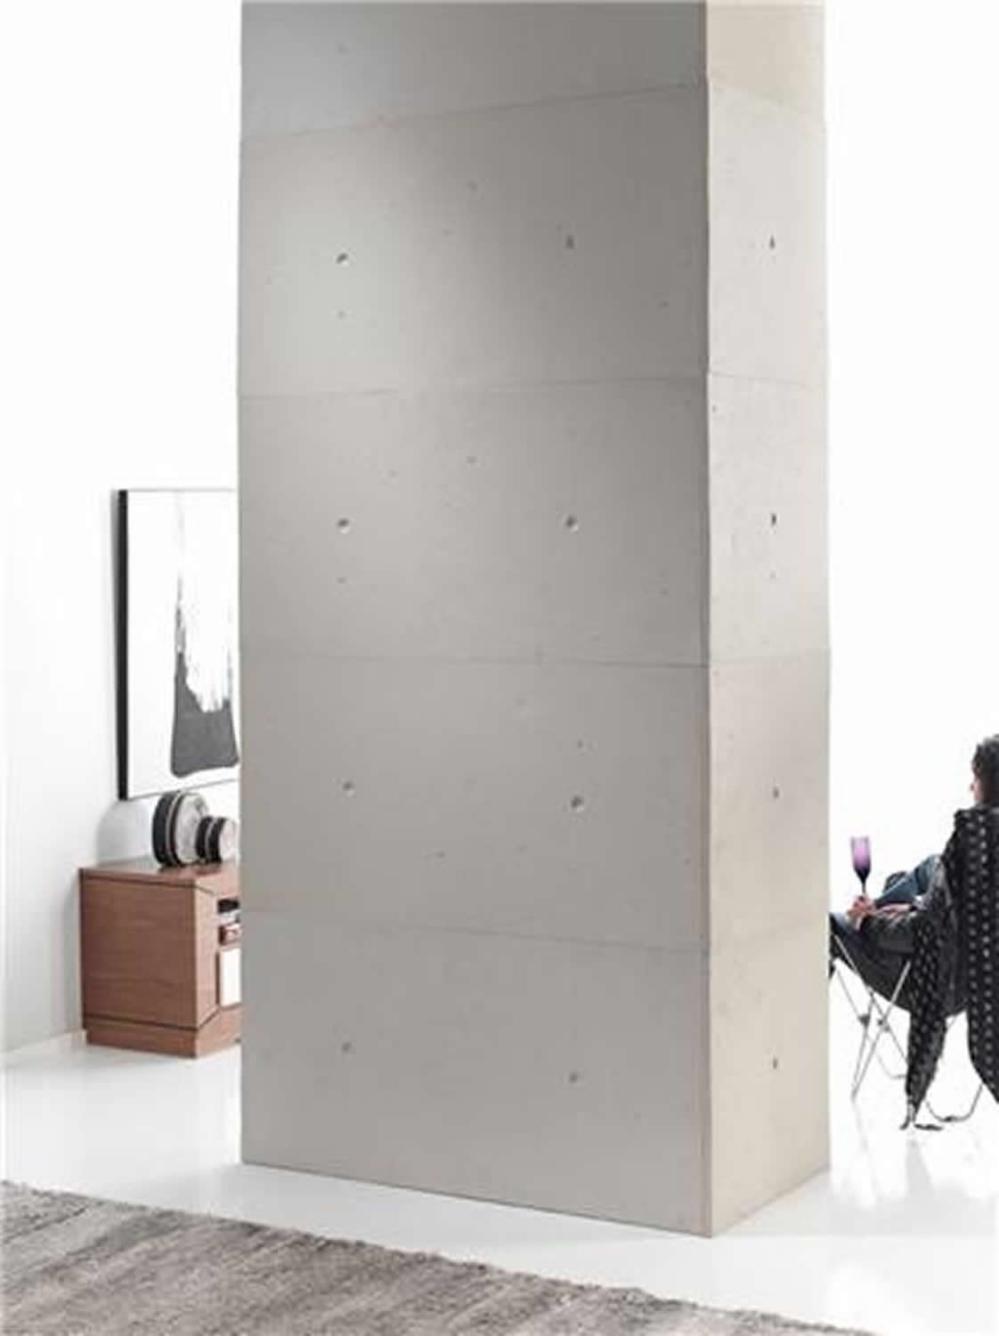 PR 320 concrete panel